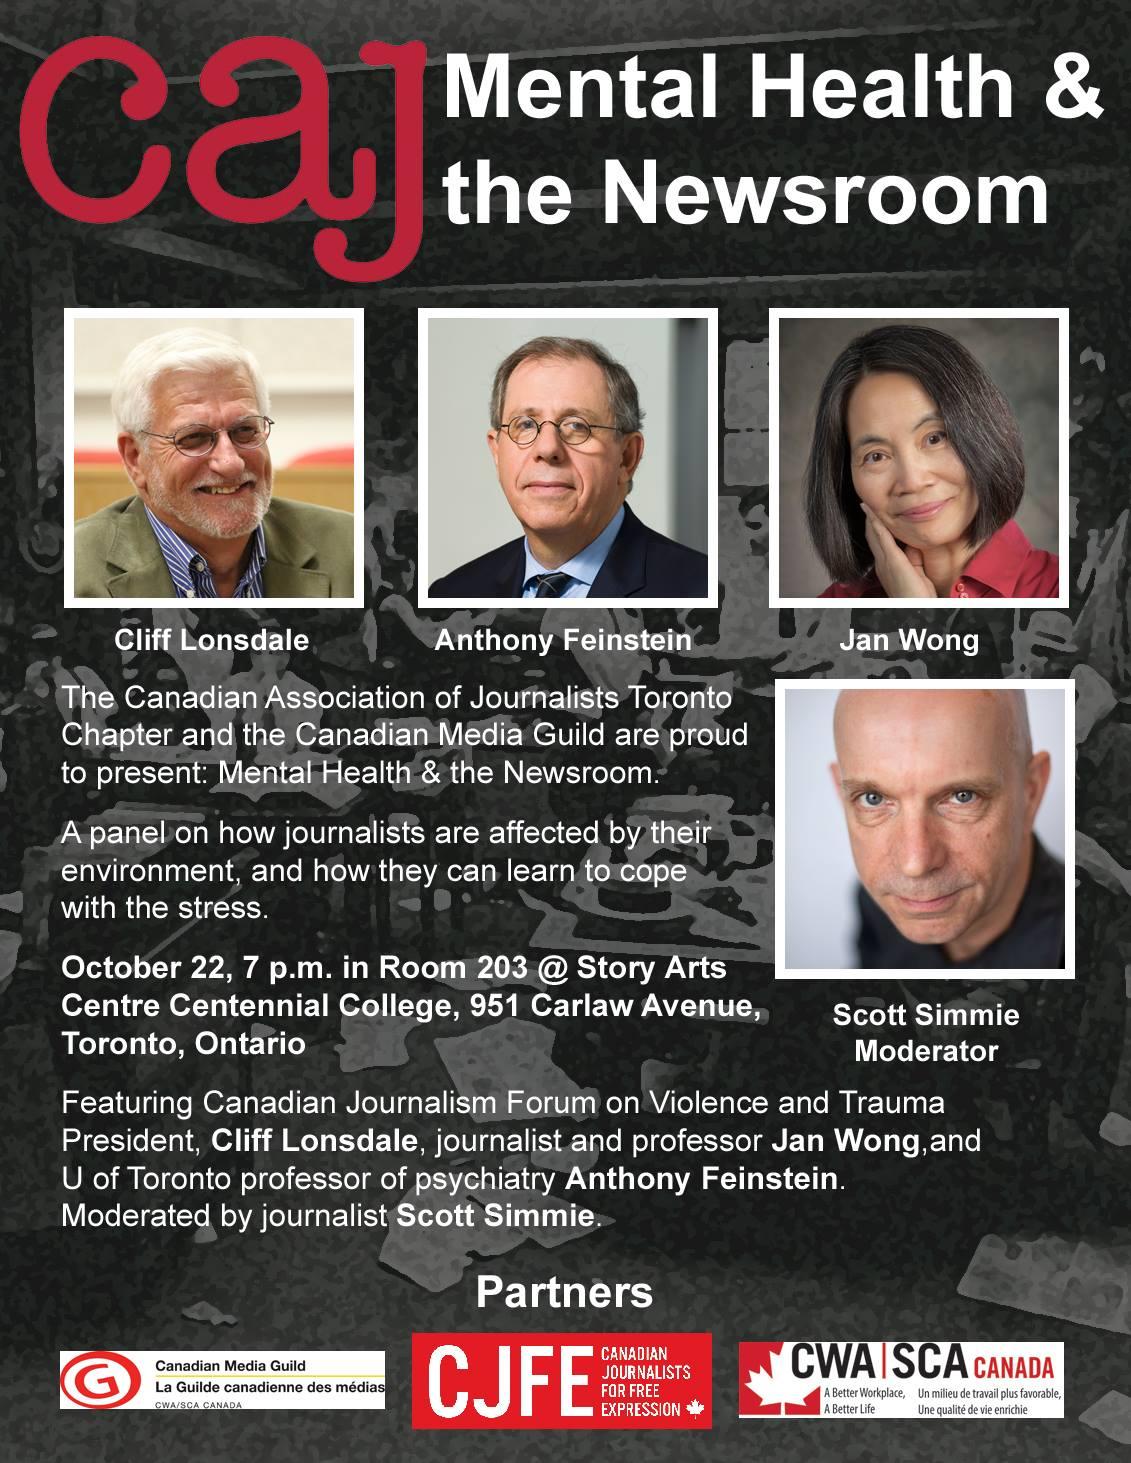 Mental Health & the Newsroom - CJFE | Canadian Journalists ...